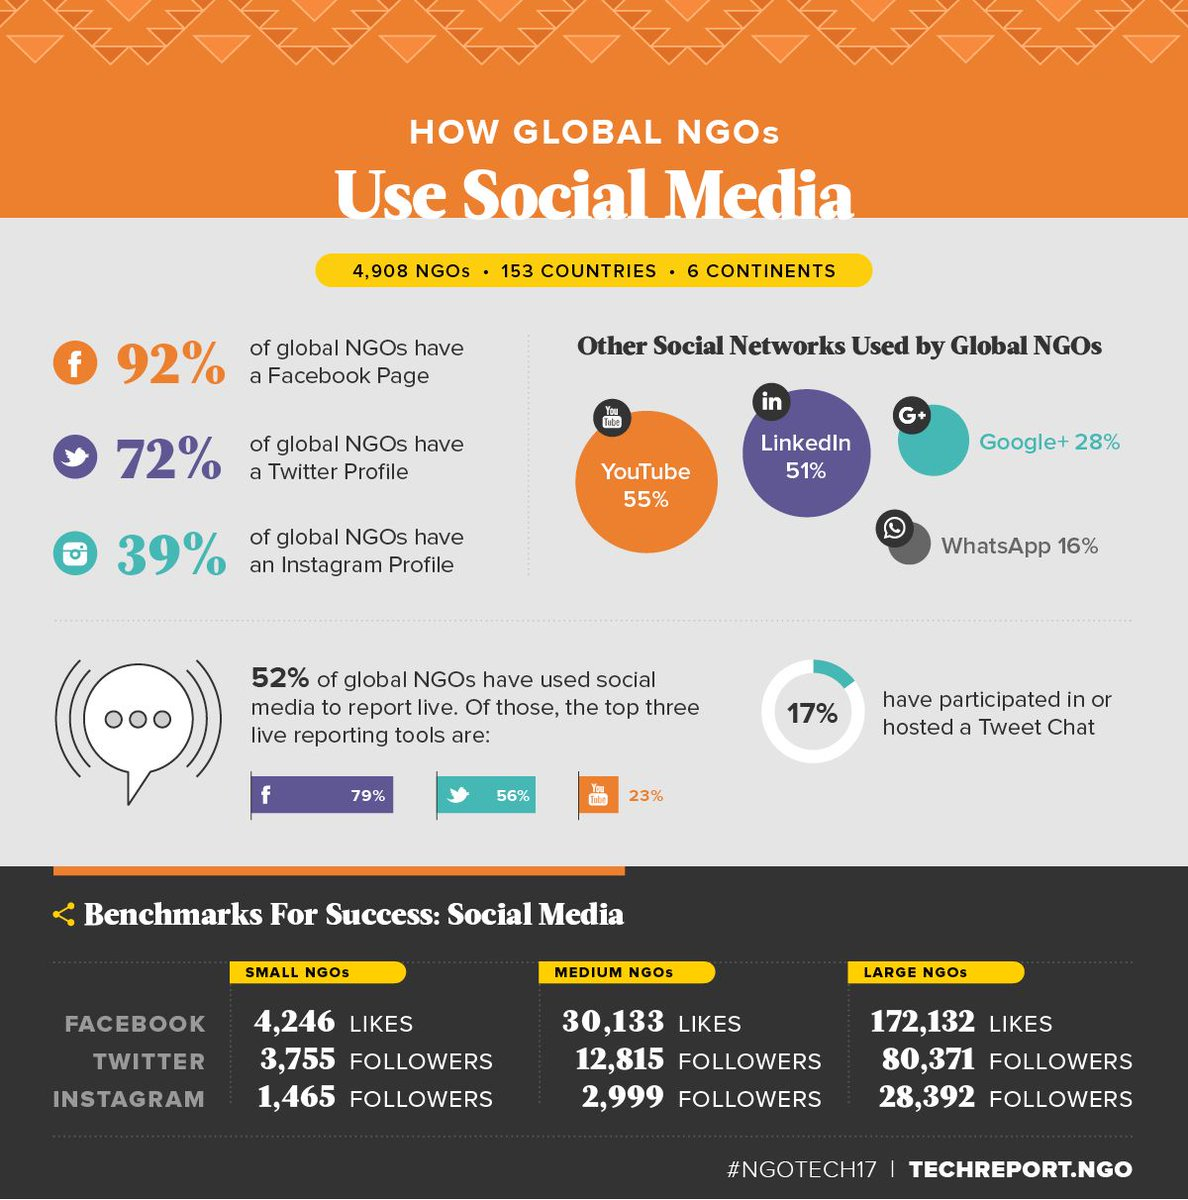 How Global NGOs Use Social Media: https://t.co/Obv2TqzQCu